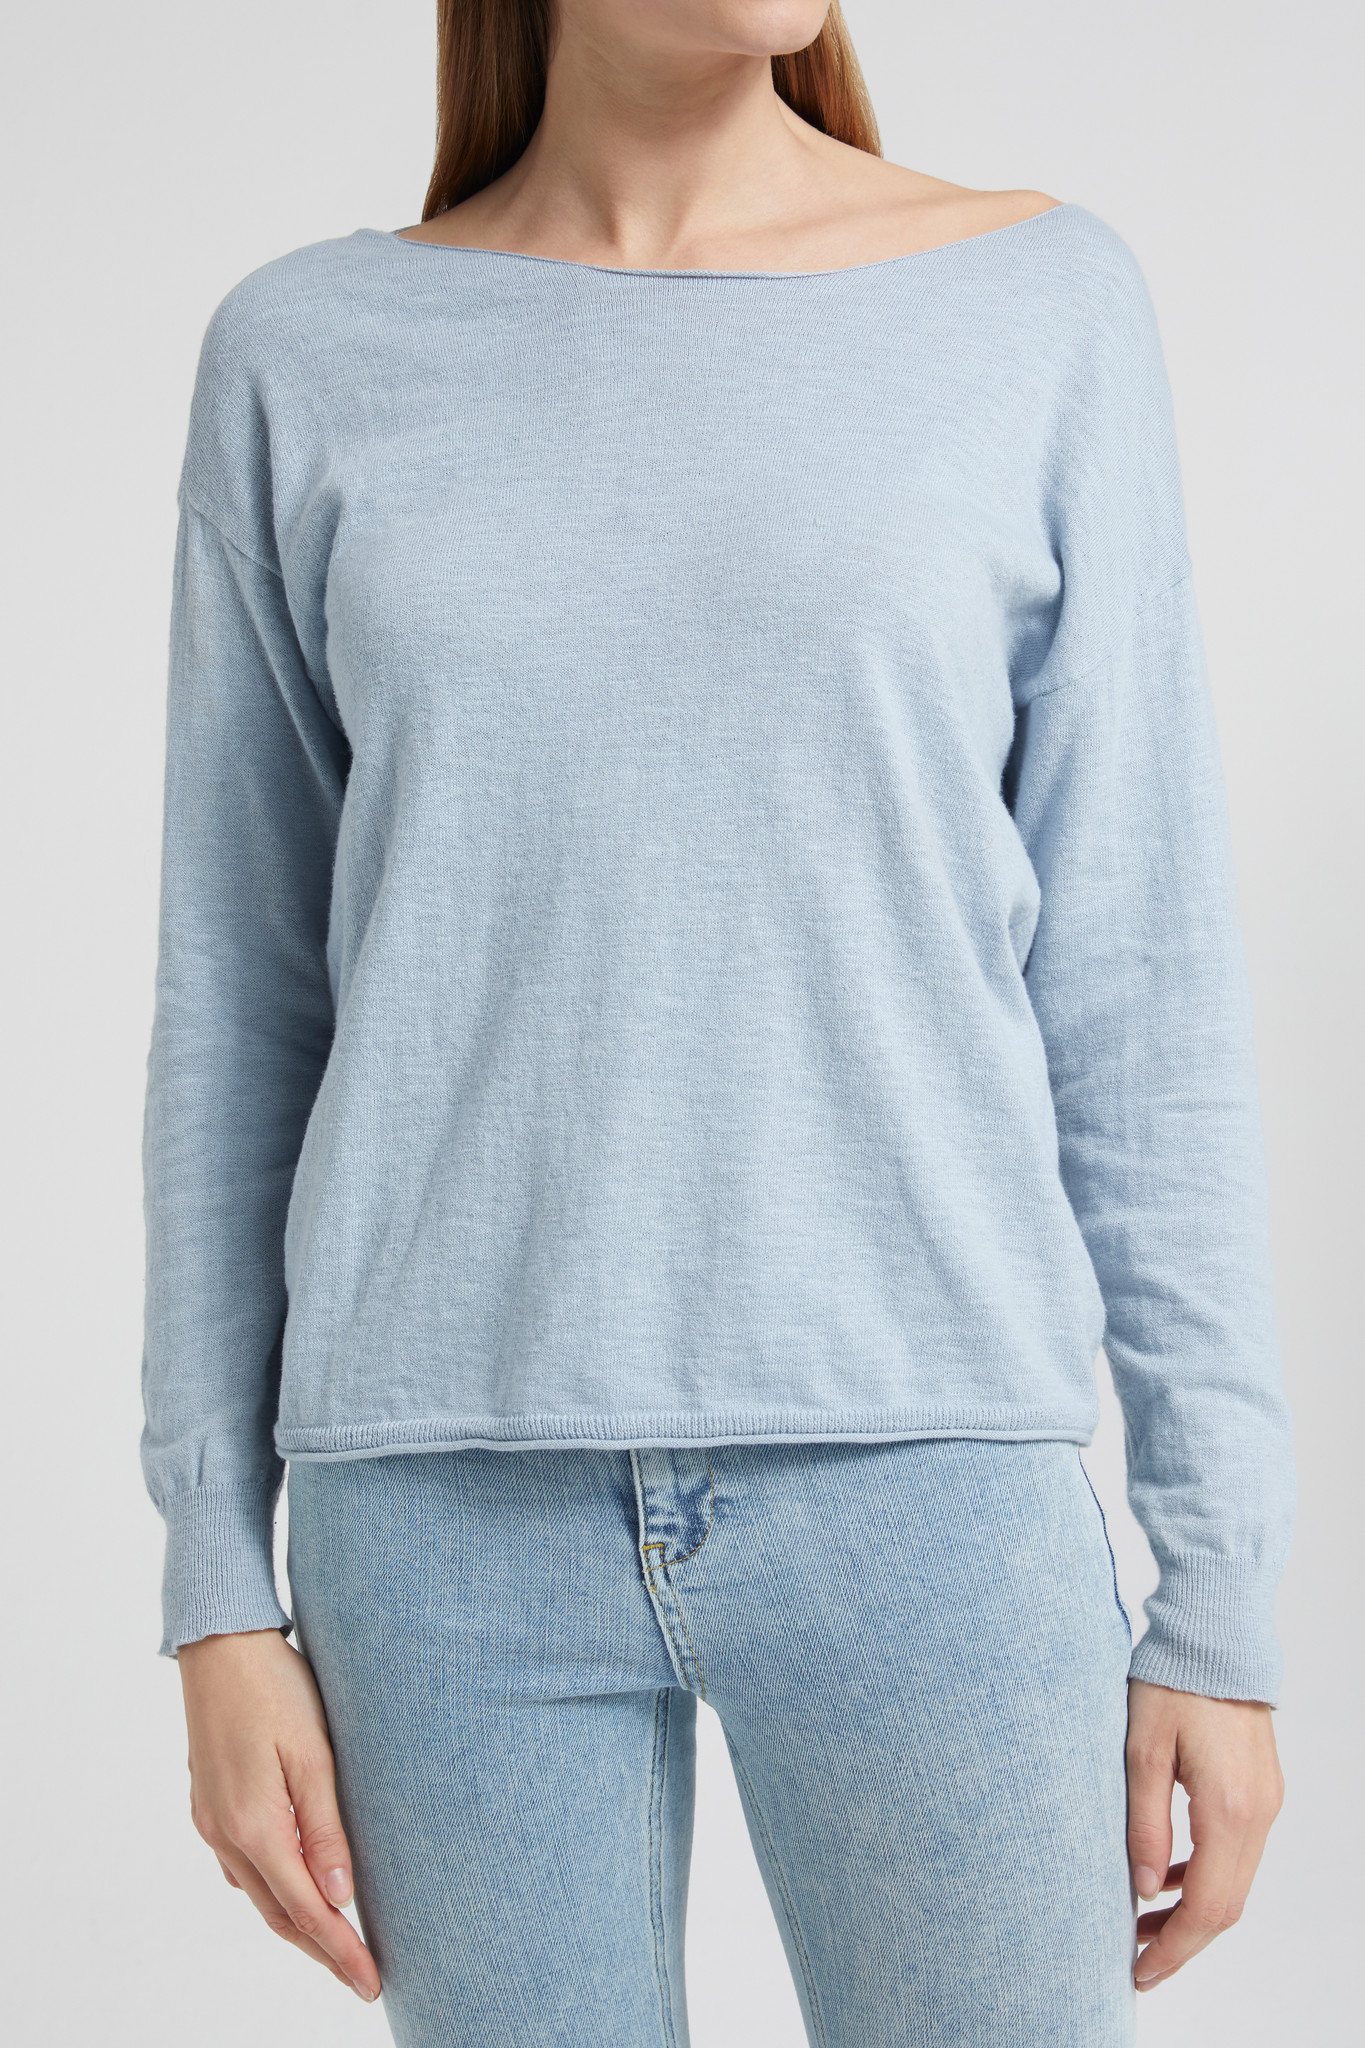 yaya Cotton cashmere blen 1000289-014-2